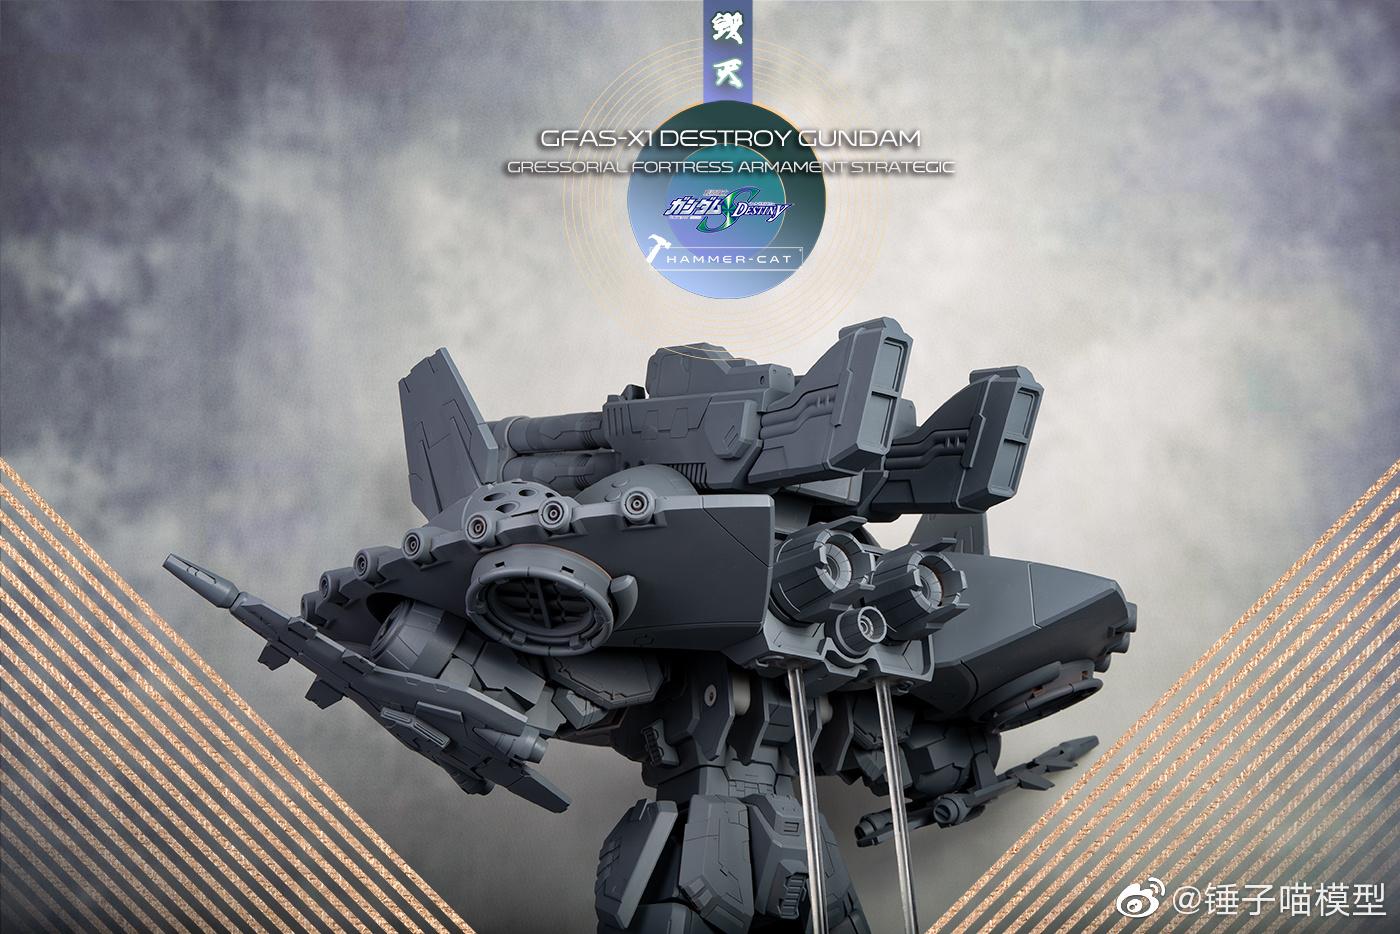 G744_GFAS_X1_Destroy_Gundam_011.jpg